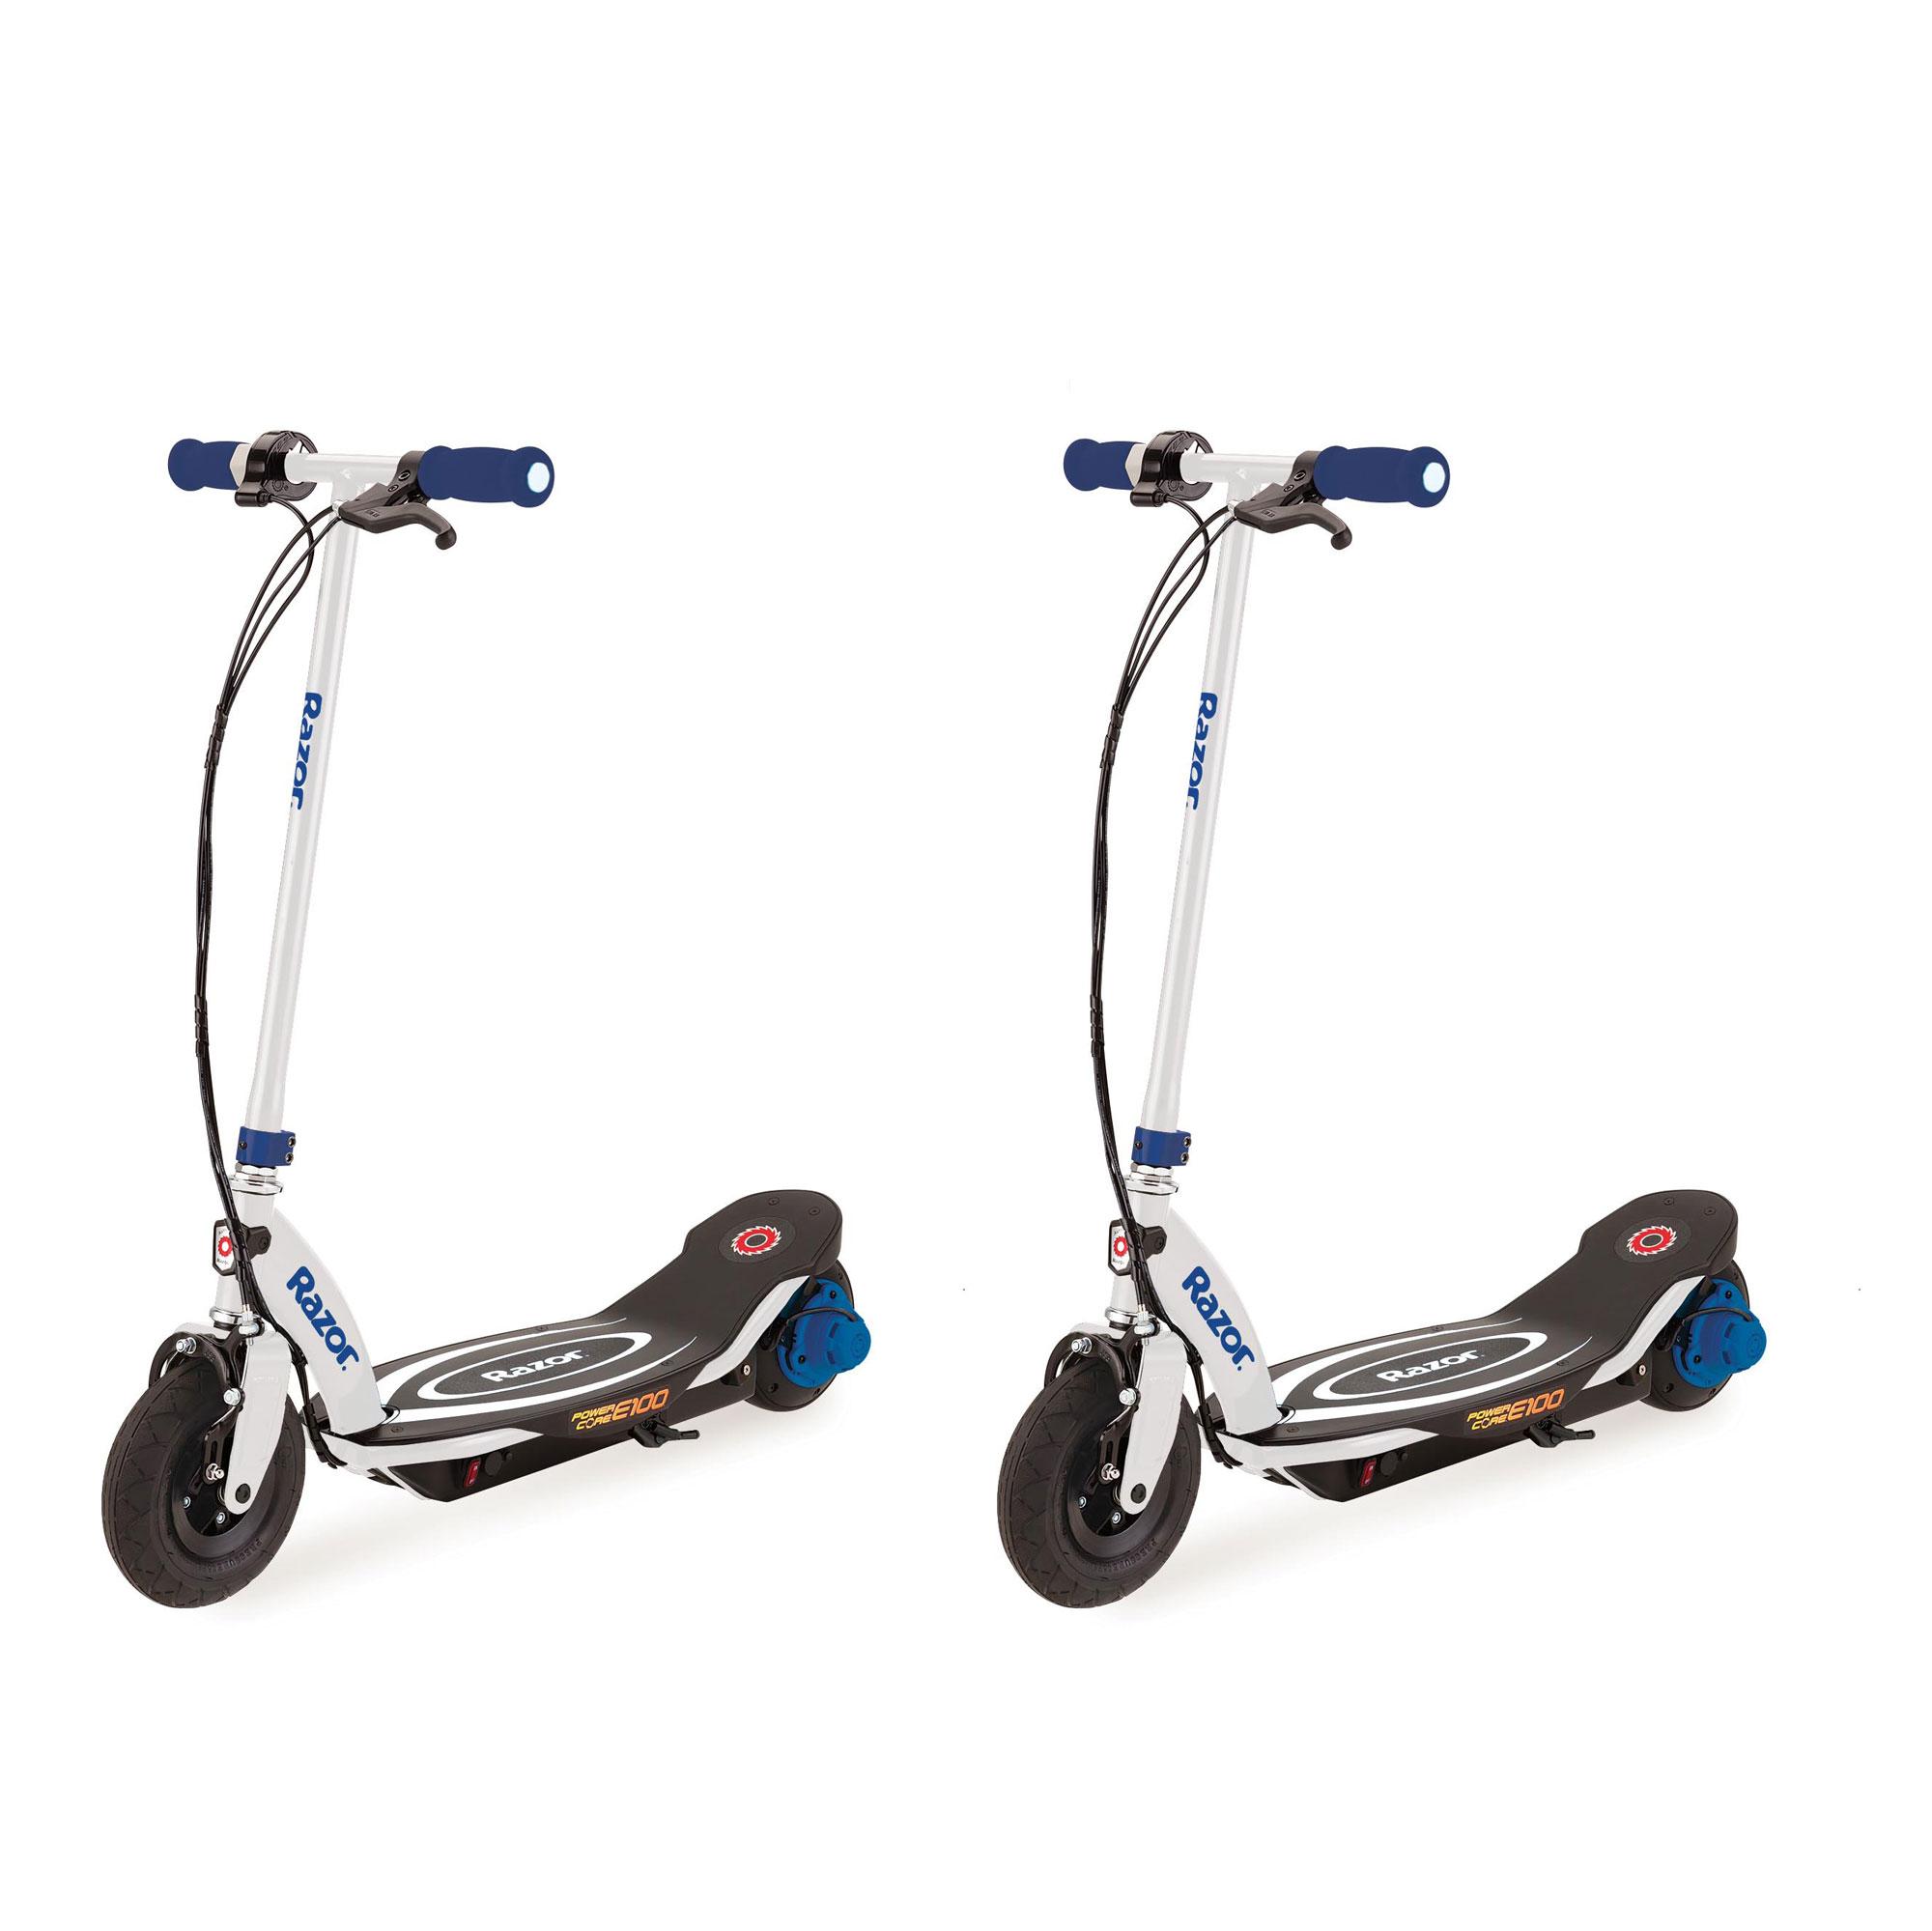 Razor Power Core E100 Electric Hub Motor Kids Motorized Scooter, Blue (2 Pack)